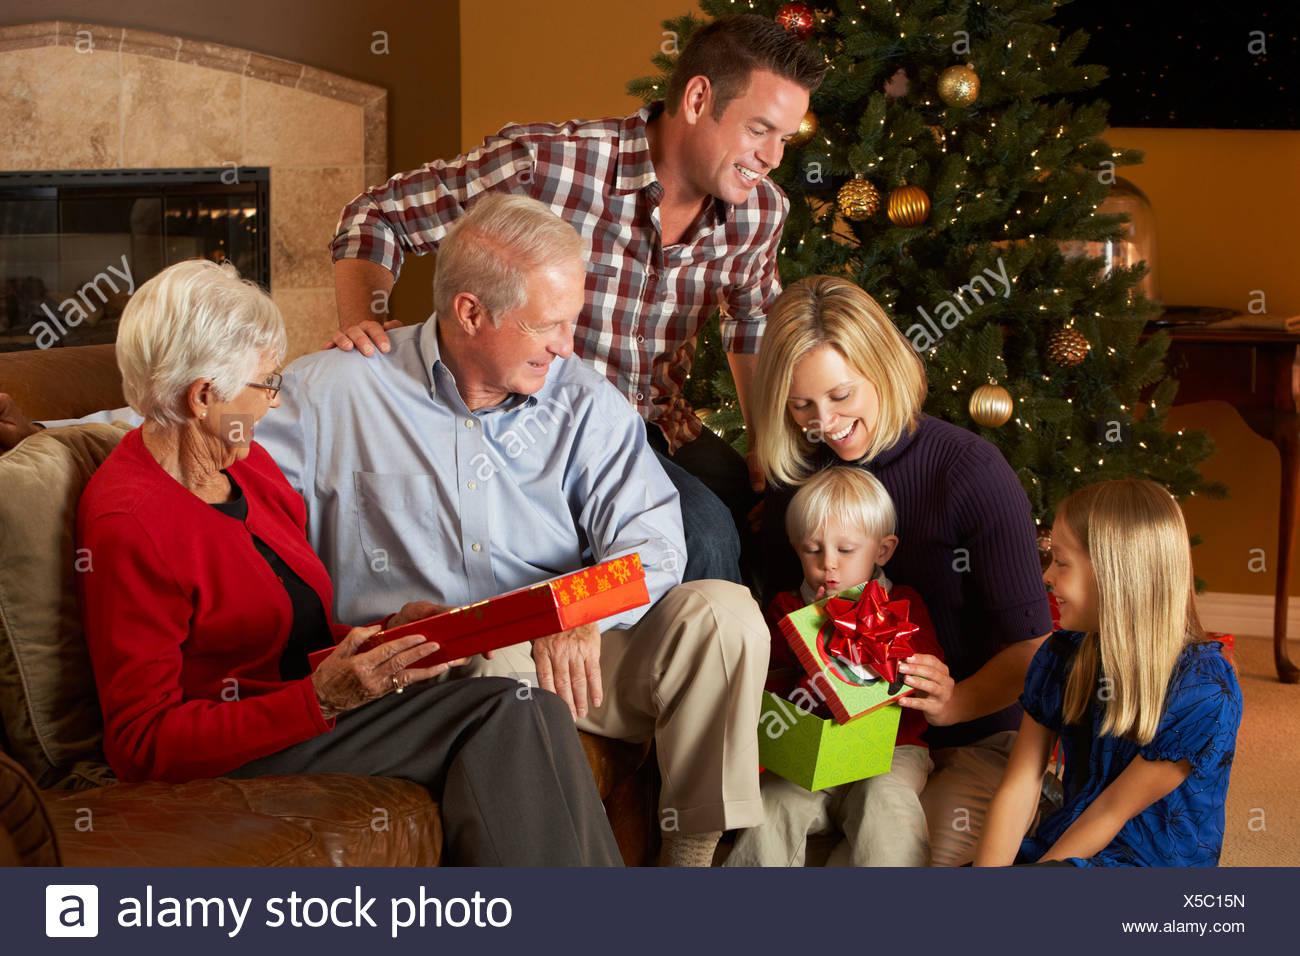 Regali Di Natale Famiglia.Multi Generazione Apertura Famiglia Regali Di Natale Nella